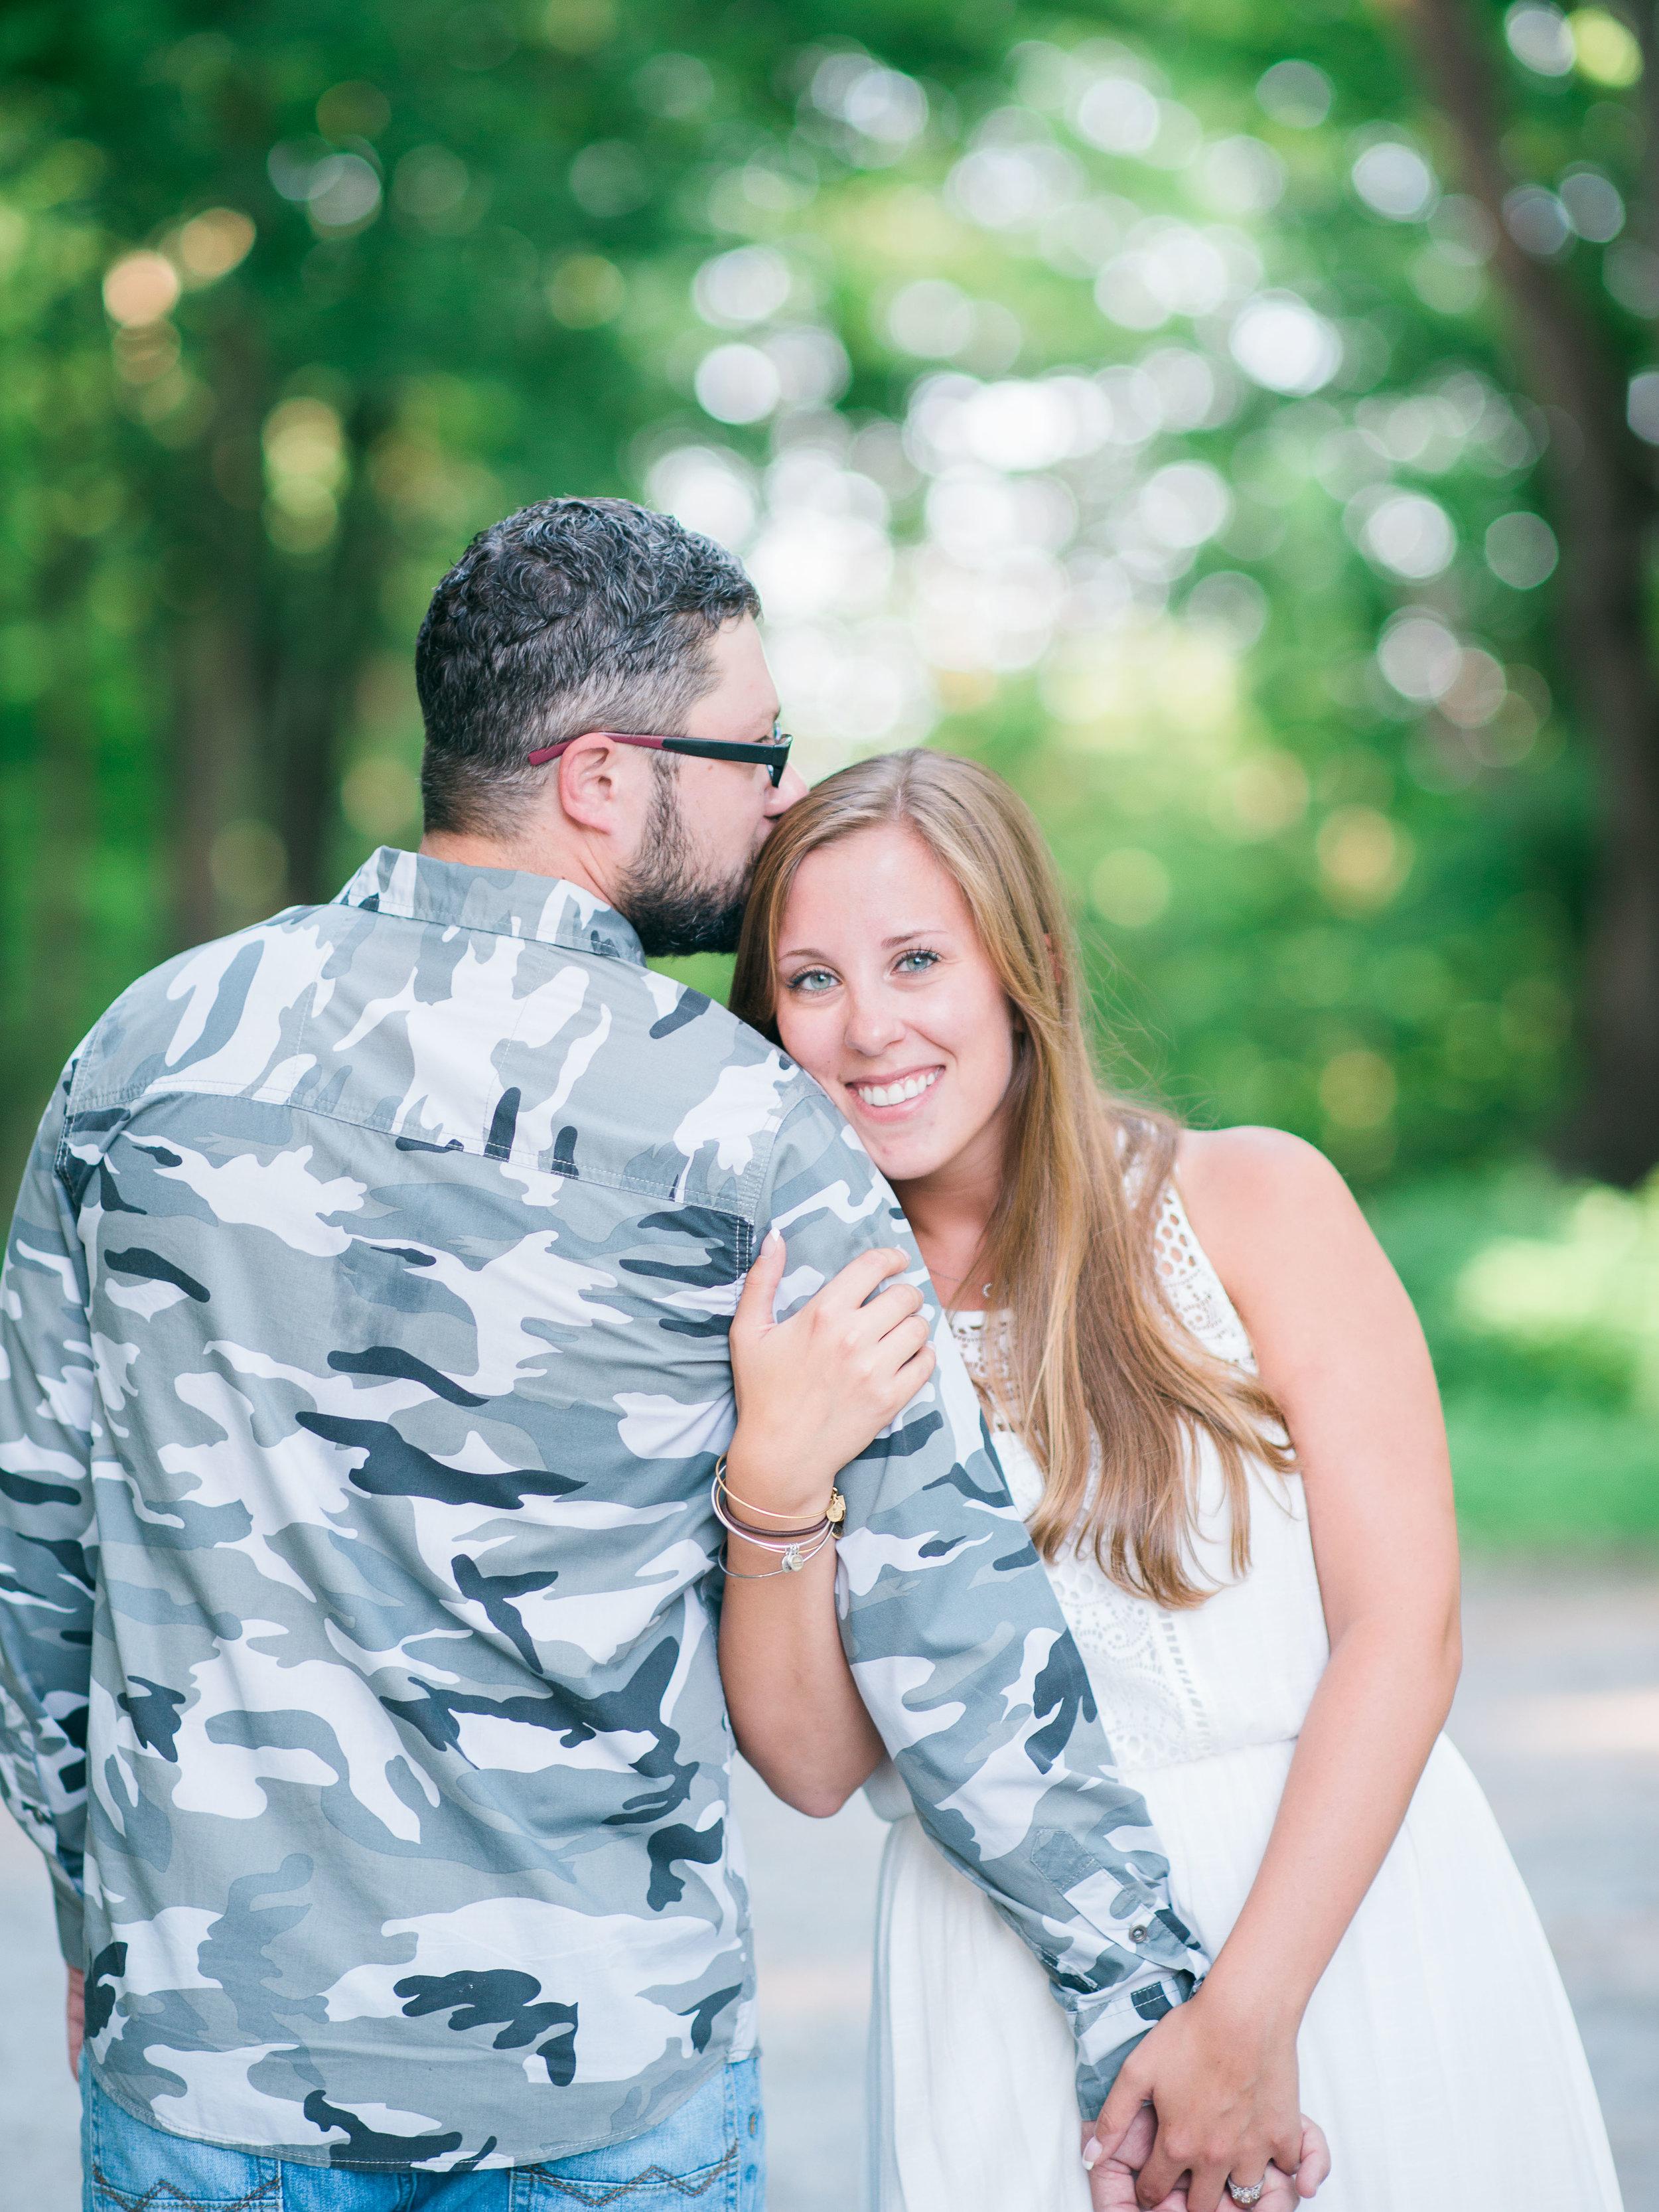 wedding photographer oxford nj